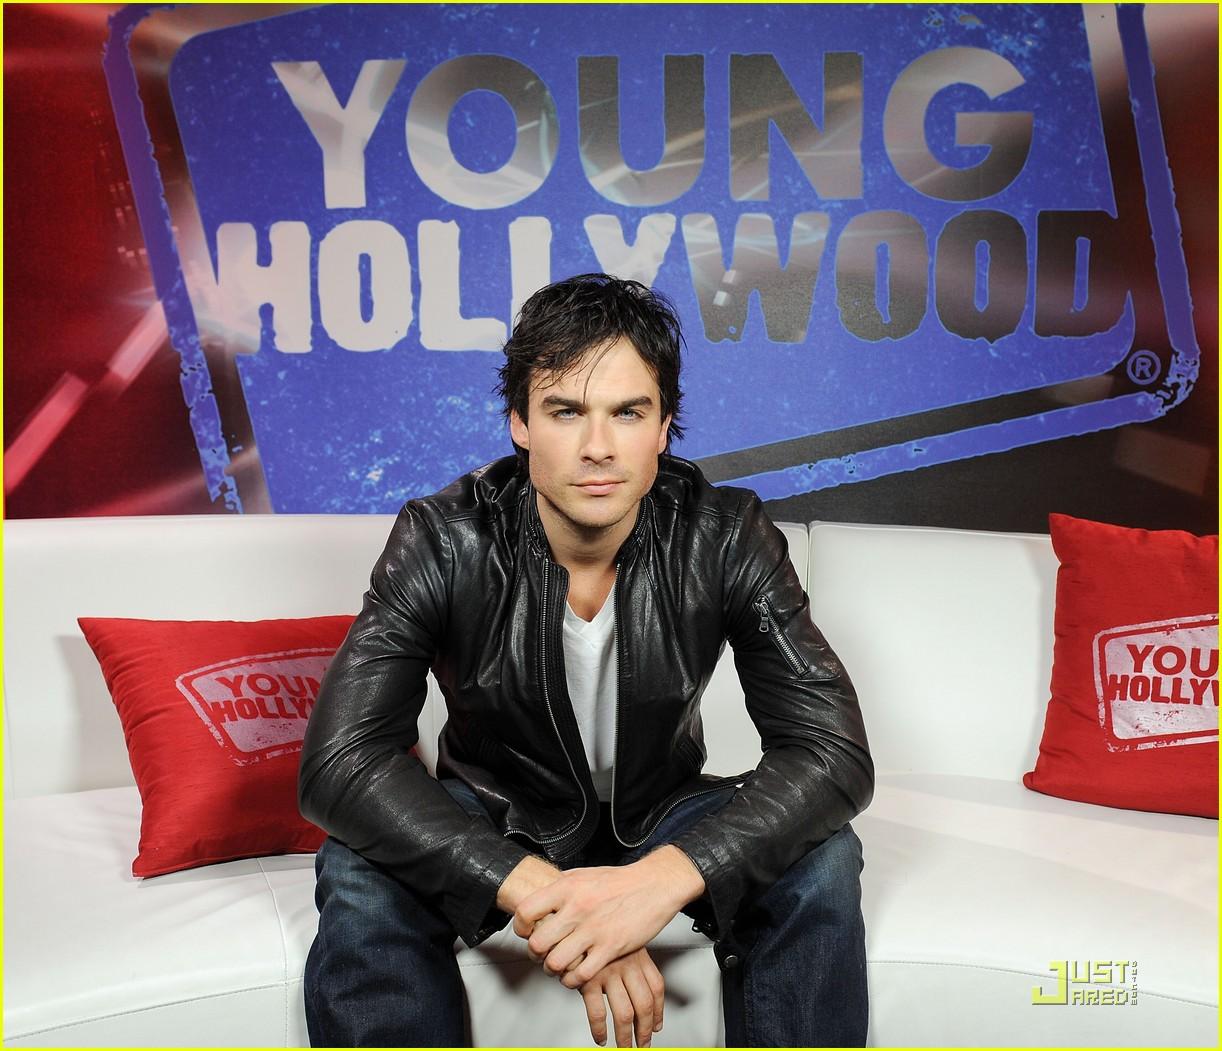 http://3.bp.blogspot.com/_OyN-8G6a64s/TMPdmxzq1mI/AAAAAAAAB1M/s3UooNnTCbs/s1600/somerhalder-young-hollywood-02.jpg